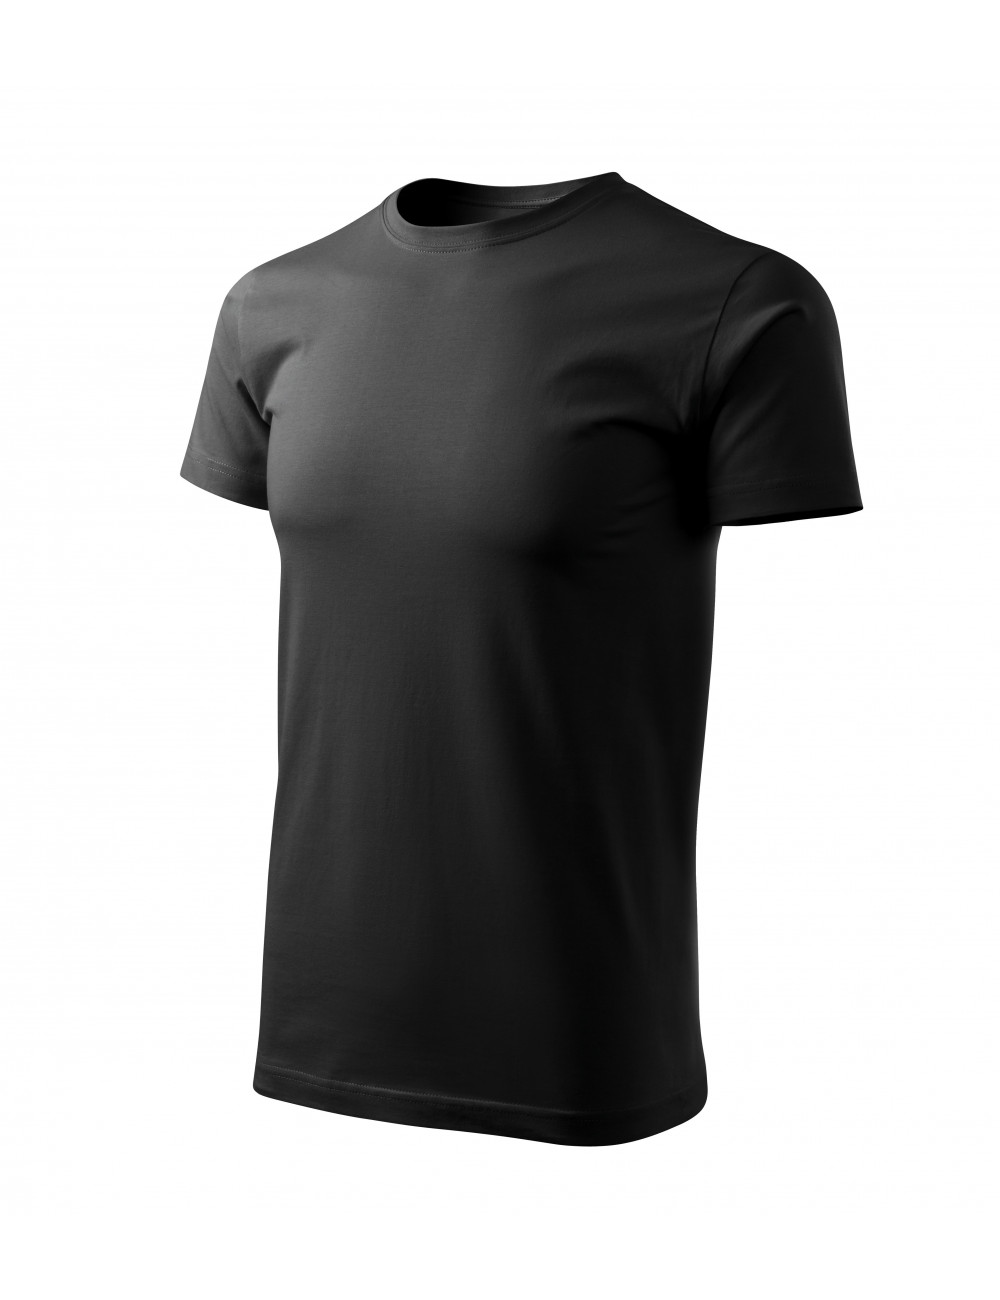 Adler MALFINI Koszulka męska Basic Free F29 czarny